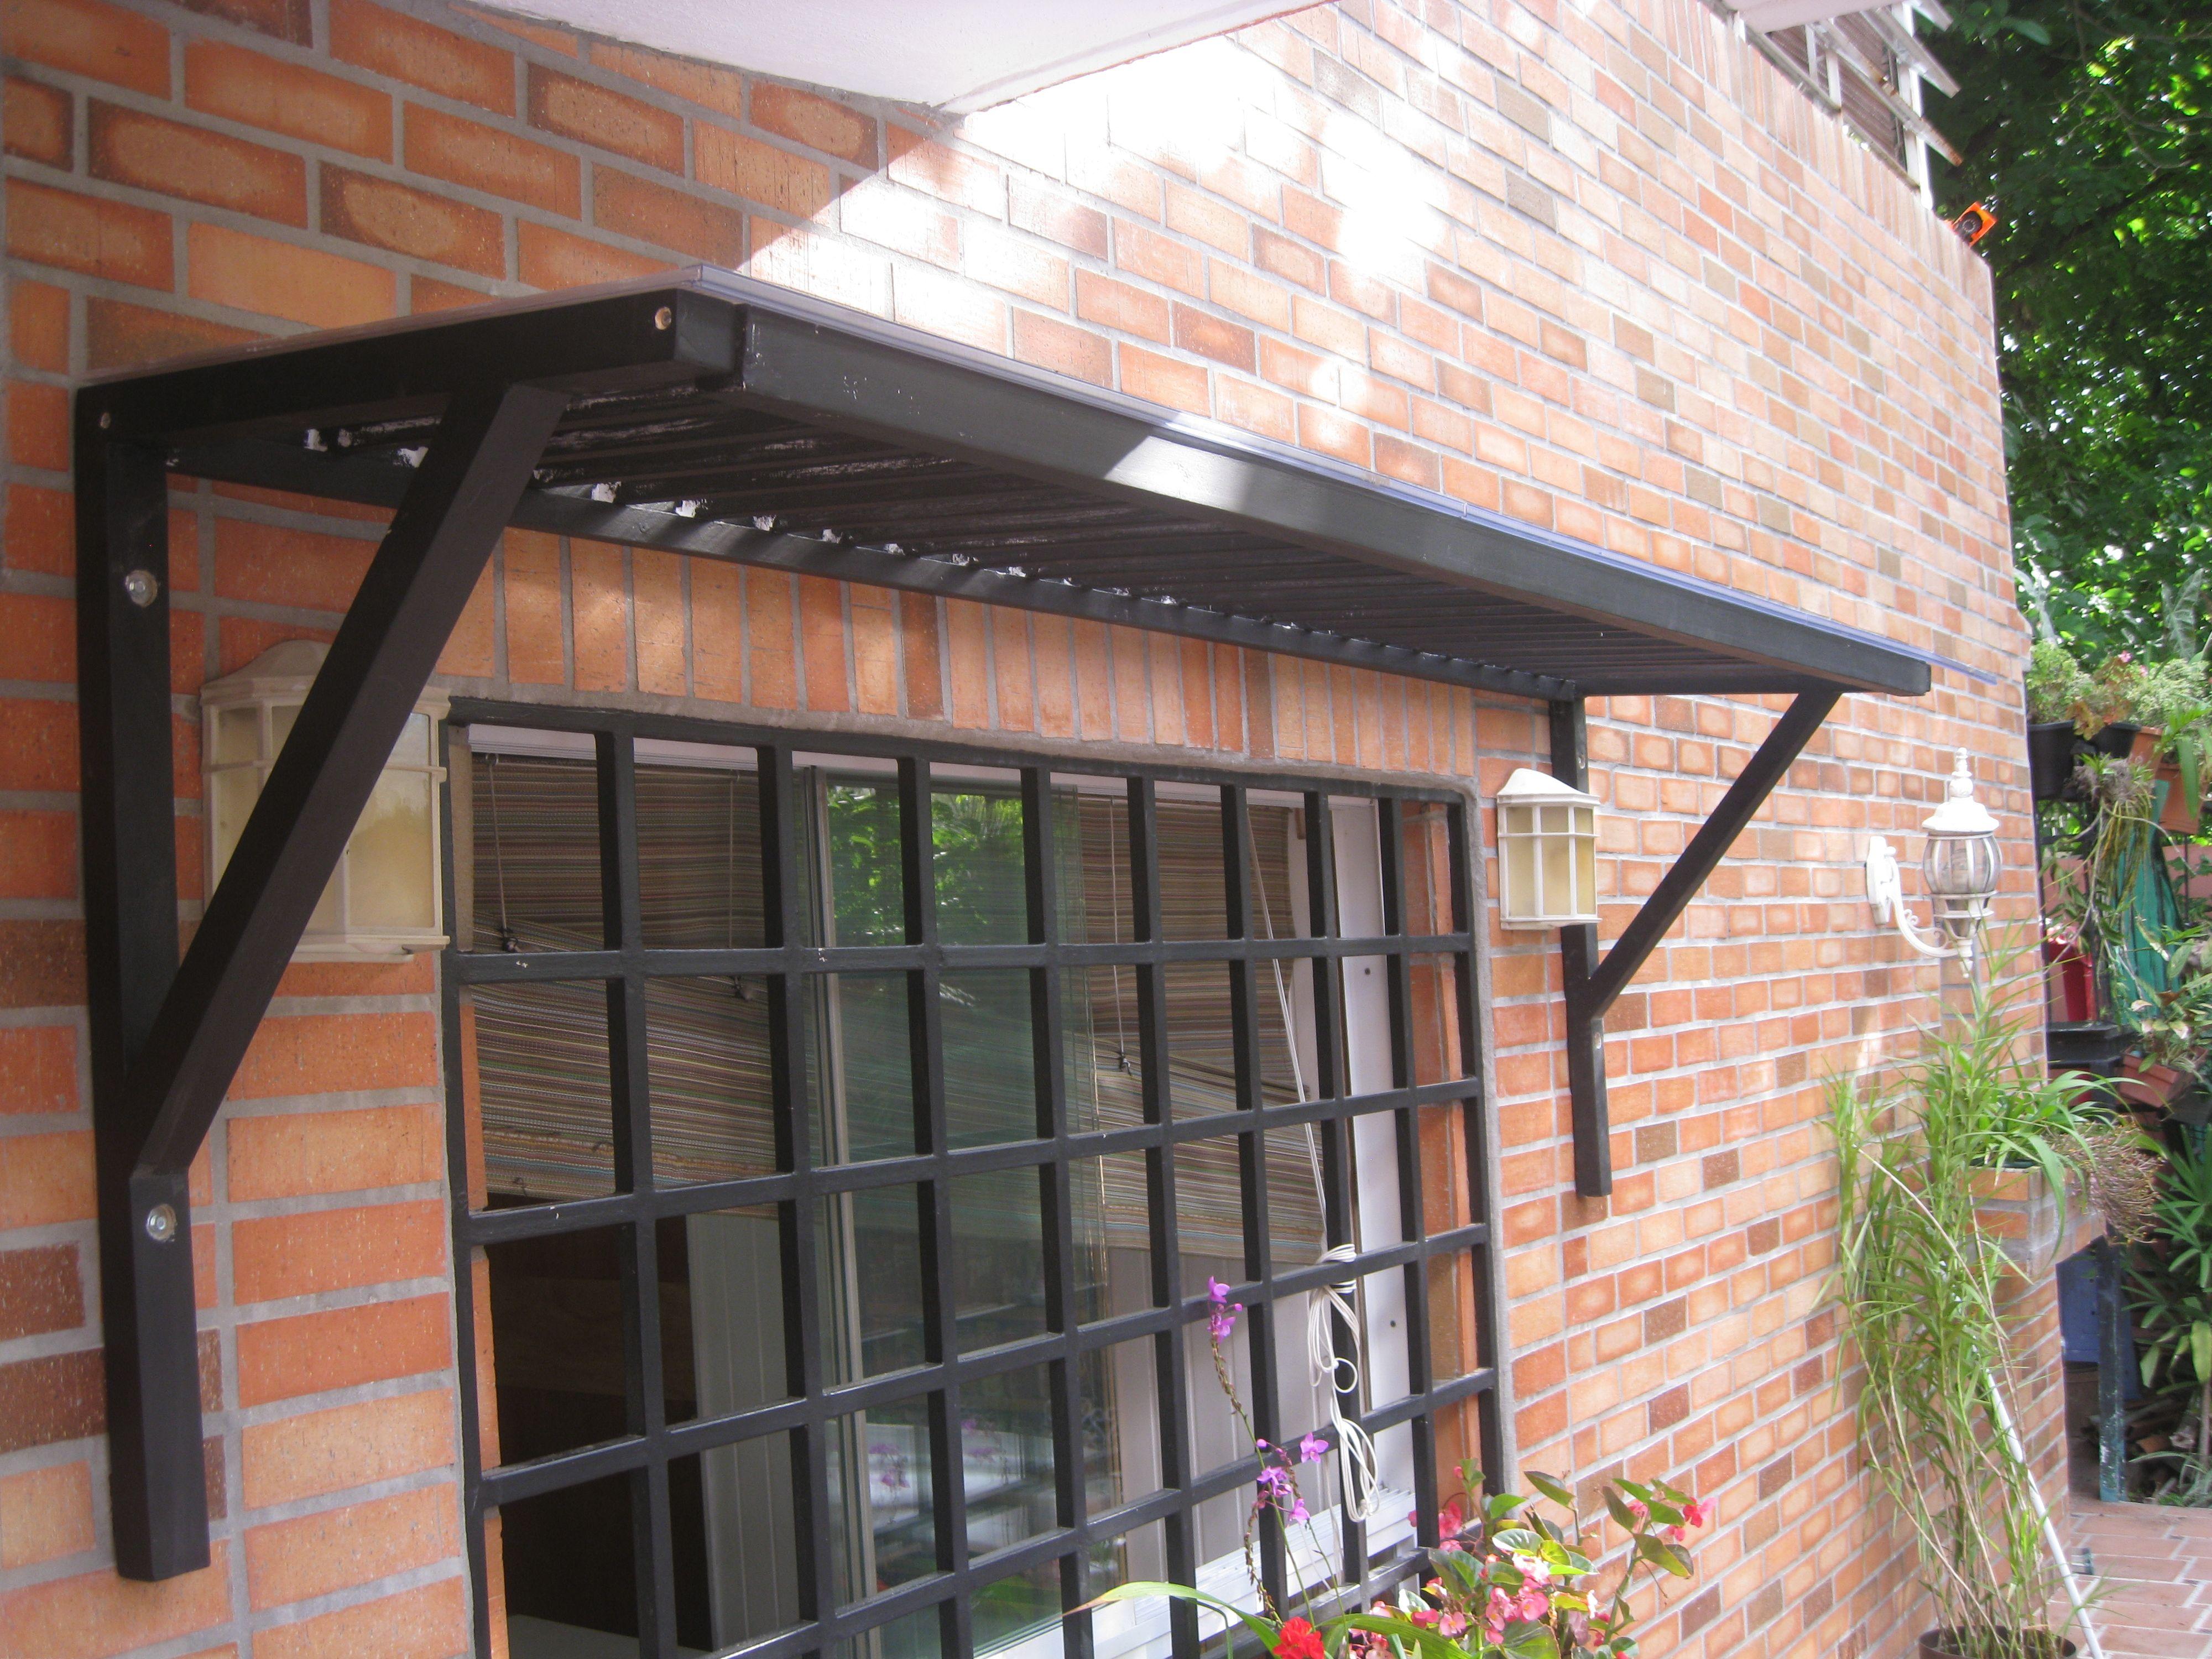 Techito para mi ventana cafeteria y panaderia for Ventanas para techos planos argentina